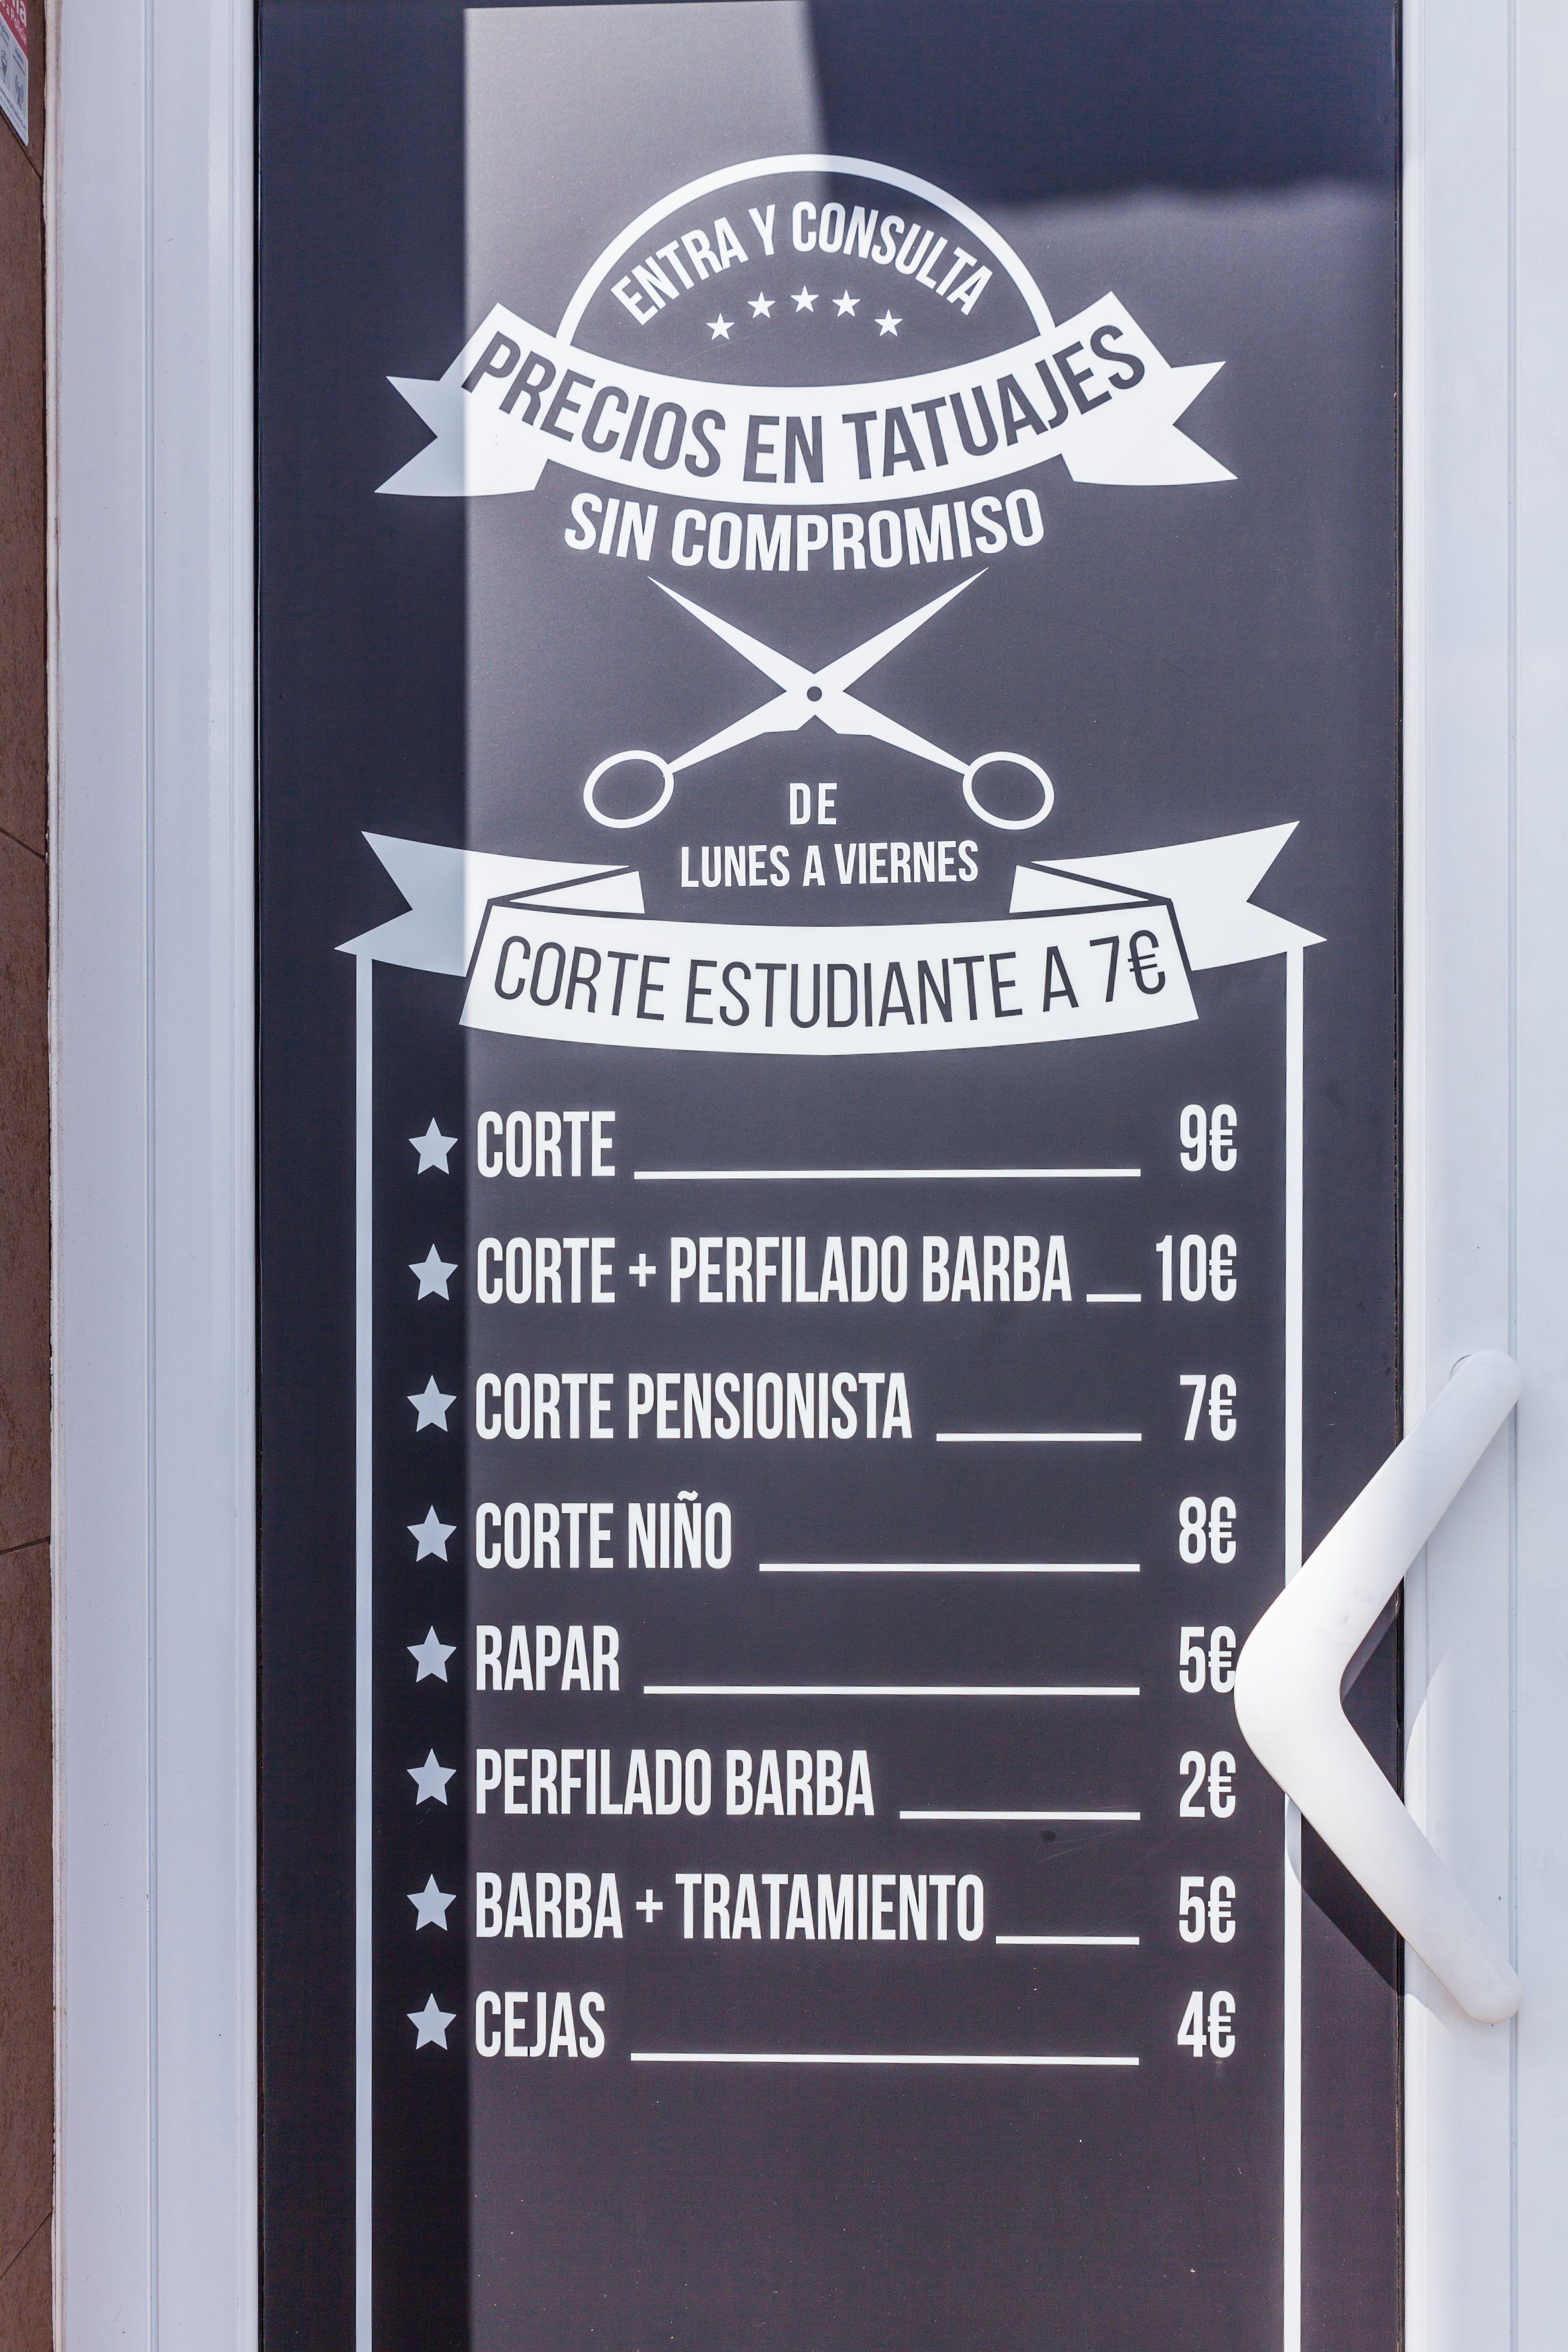 Foto 3 de Peluquerías de hombre en San Cristóbal de La Laguna   The Hope Barber Shop & Tattoo Studio